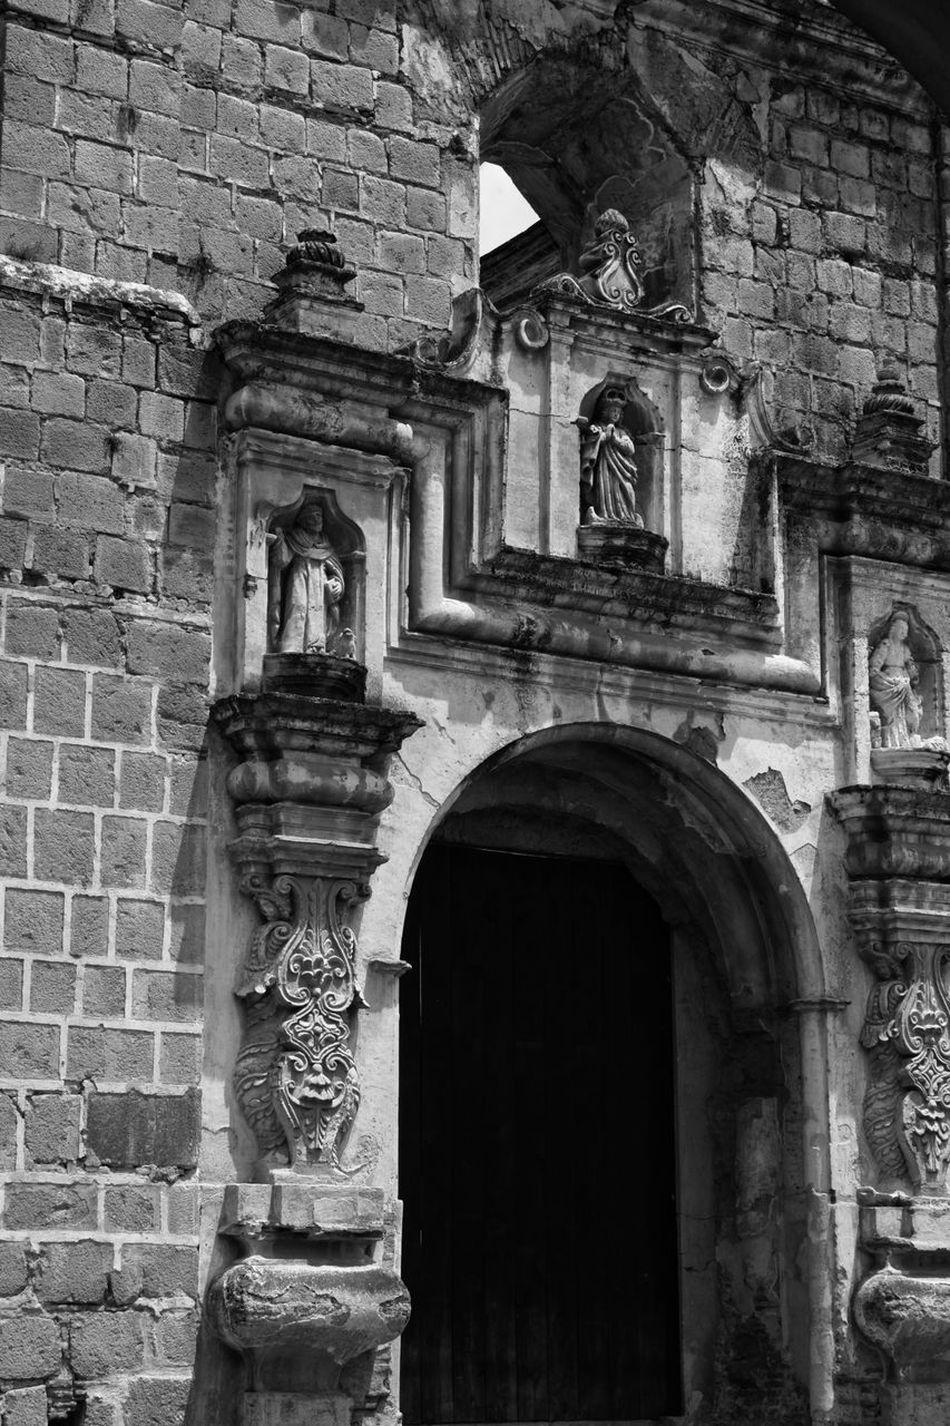 Architecture Built Structure Arch Building Exterior Facade Building Travel Destinations Religion Cultures Travel Famous Place History Day Monument City Blackandwhite